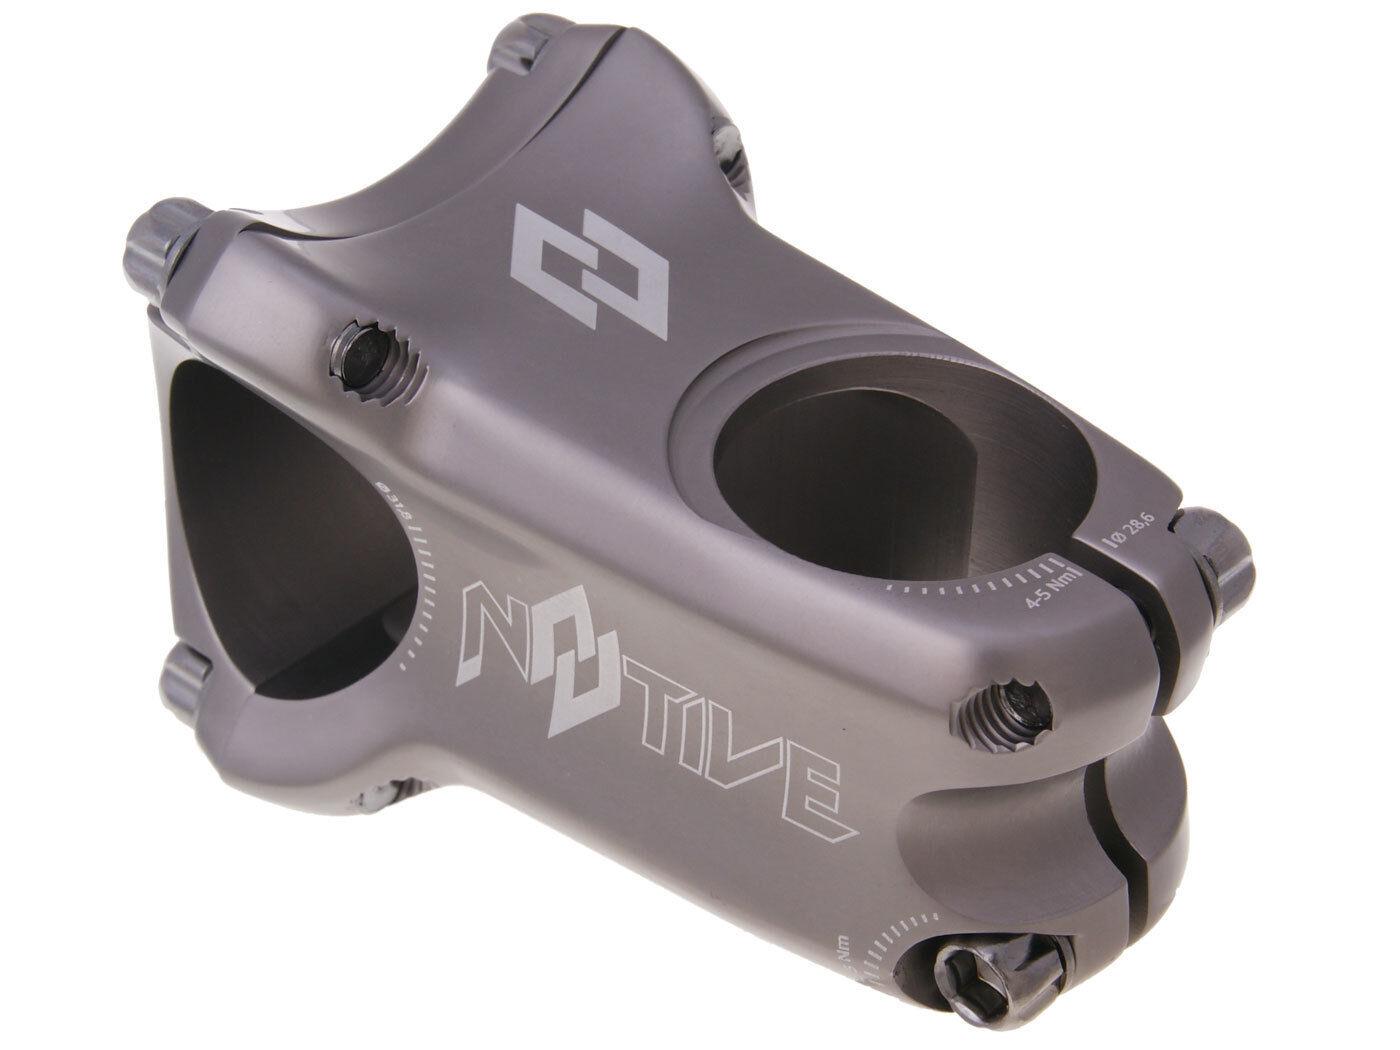 N8tive Enduro Attacco Del Manubrio 6066-651 Alluminio MTB Downhill grey  Moto  quality first consumers first